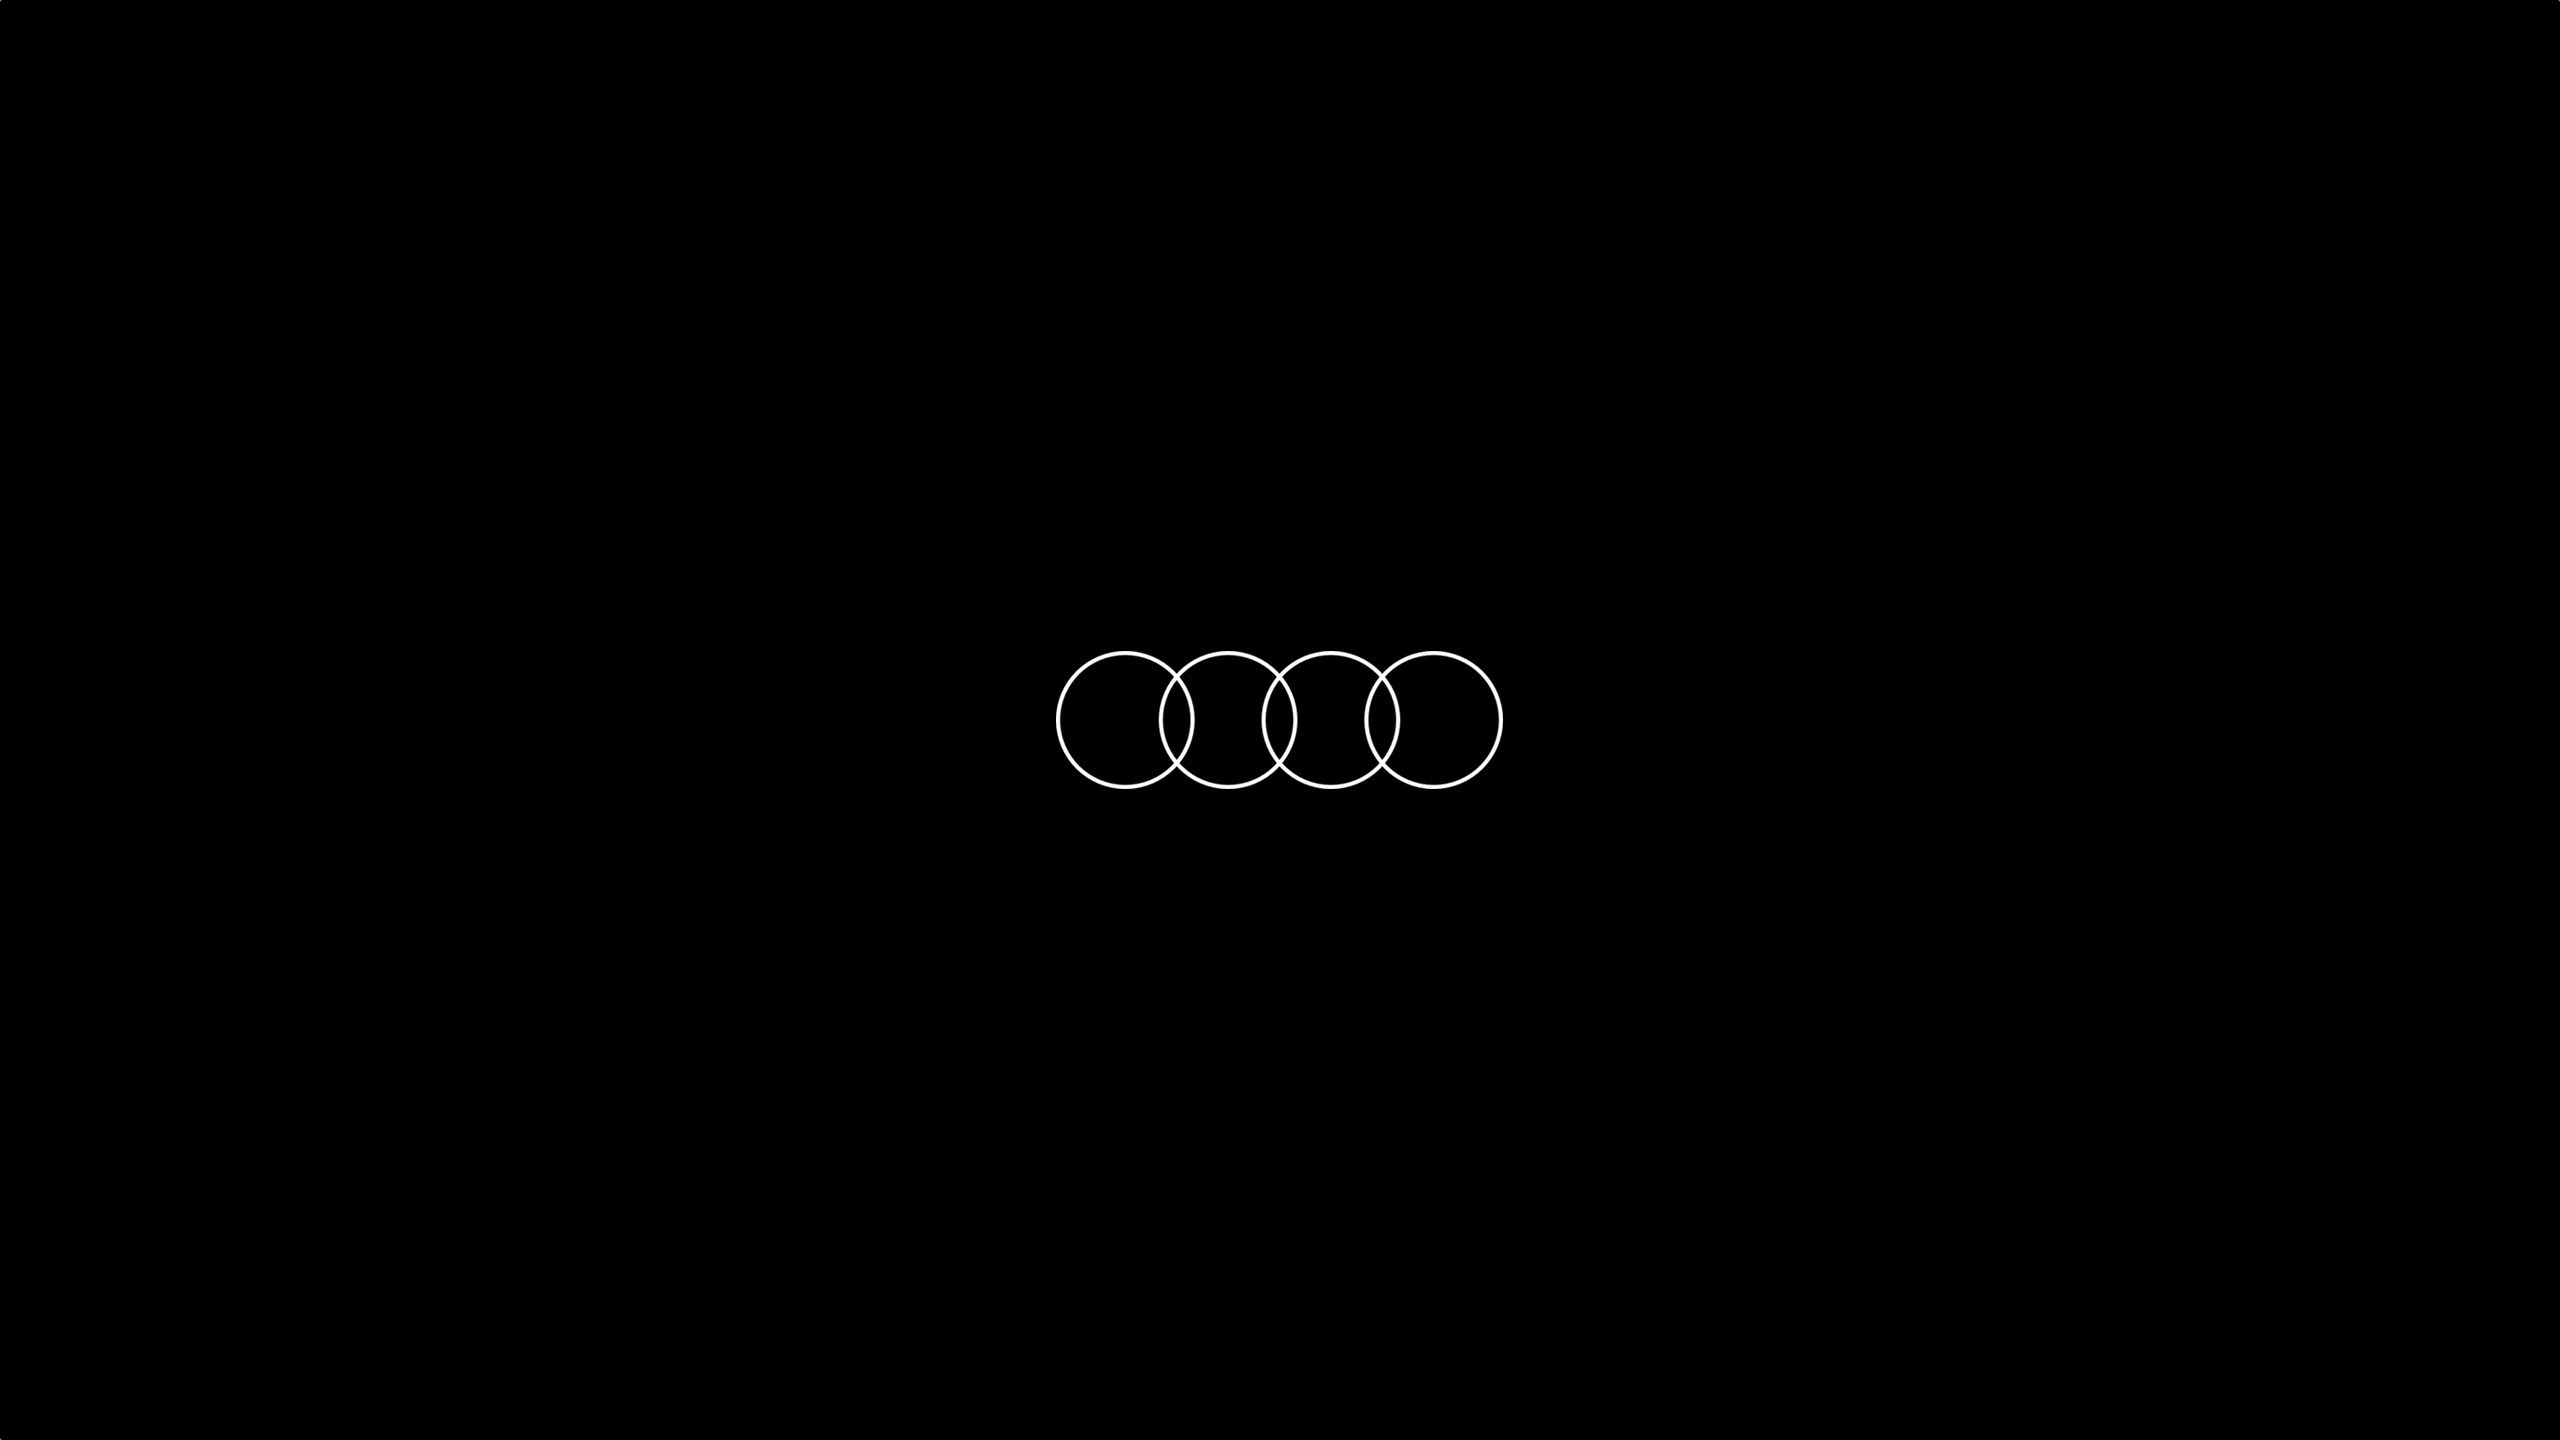 Audi Sports Car Wallpaper Audi Logo Wallpaper Hd Pixelstalk Net